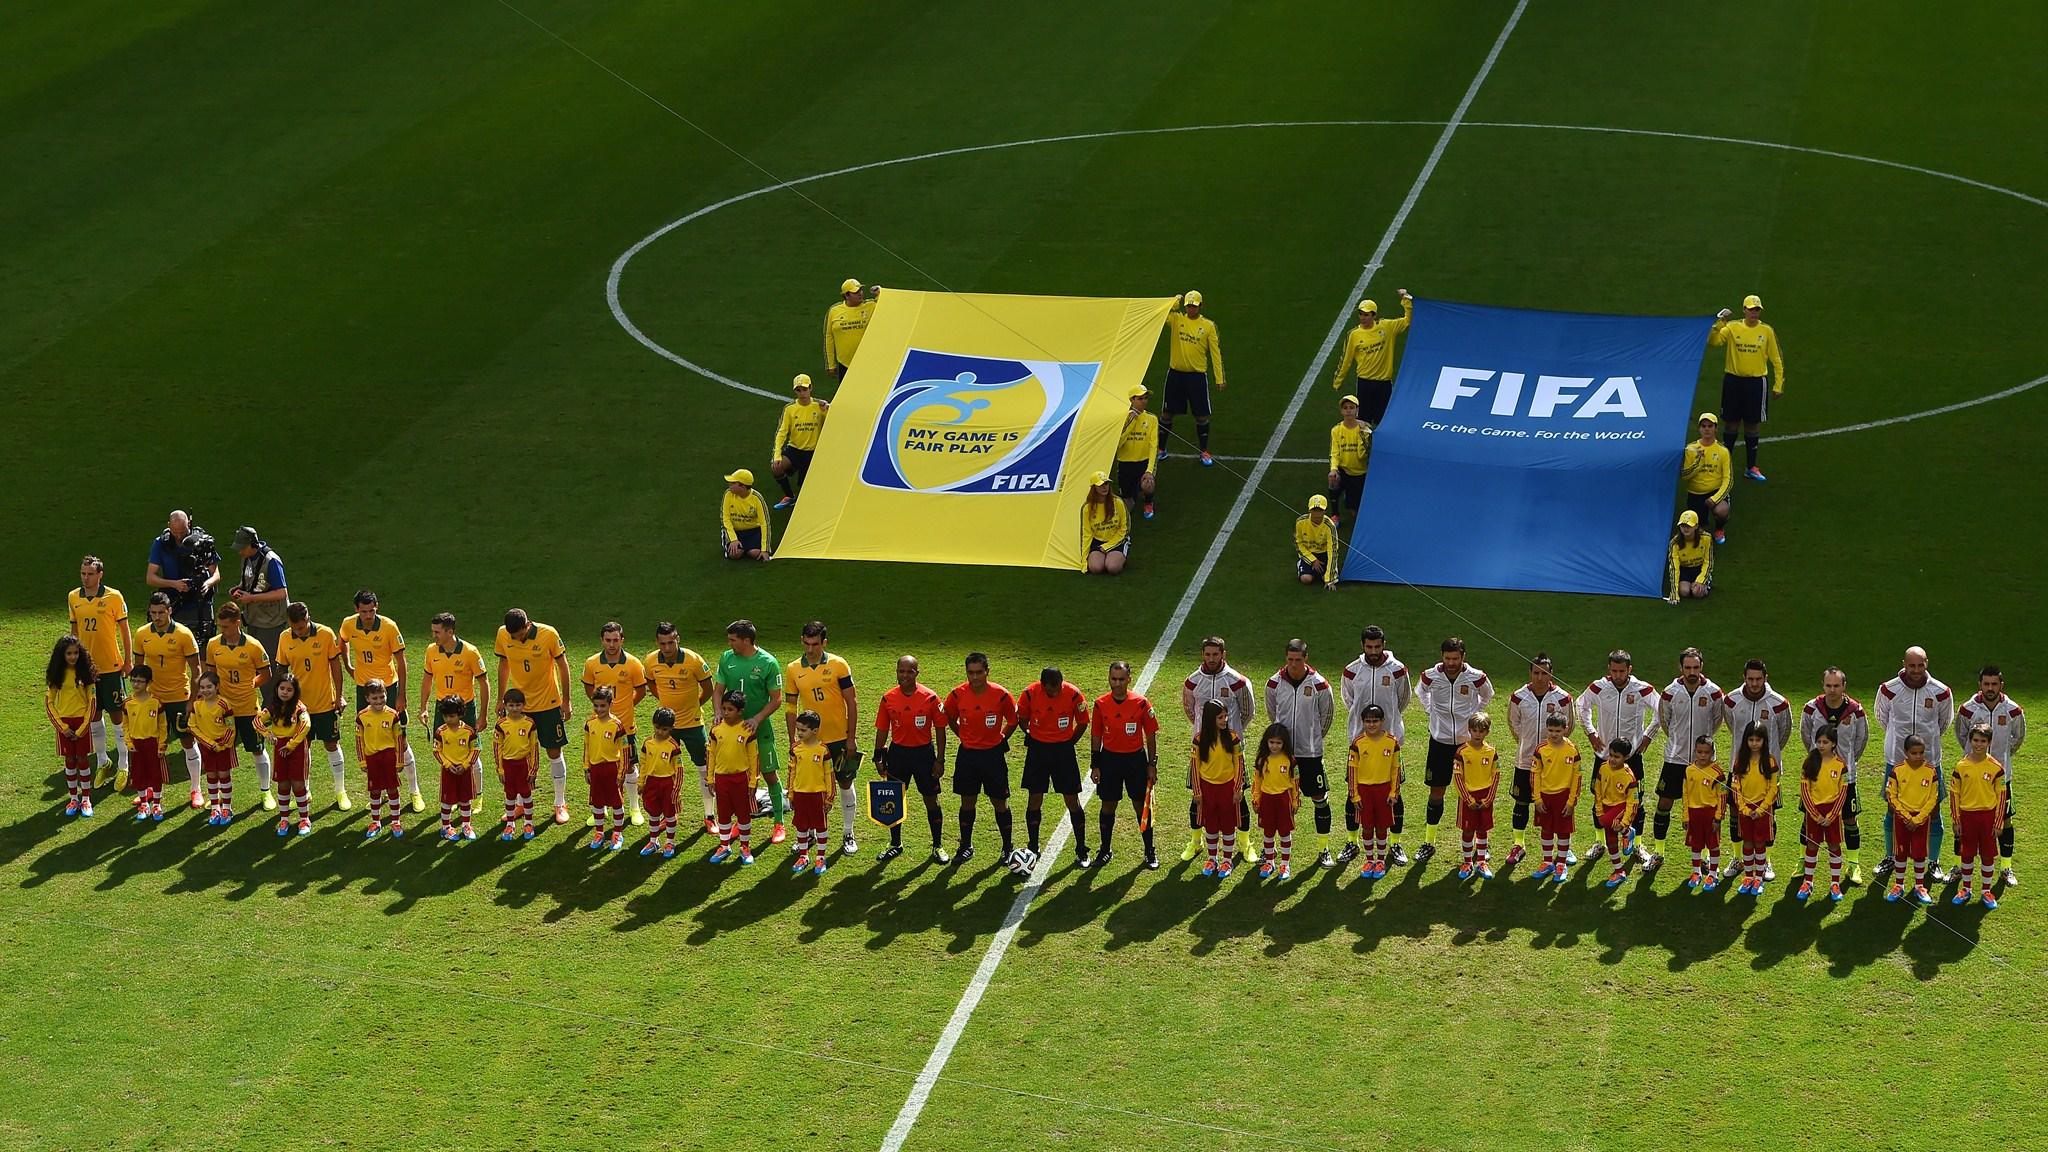 85 - Australia-Spain [0-3] -- 23 Jun 2014 - 13-00 - kuaza